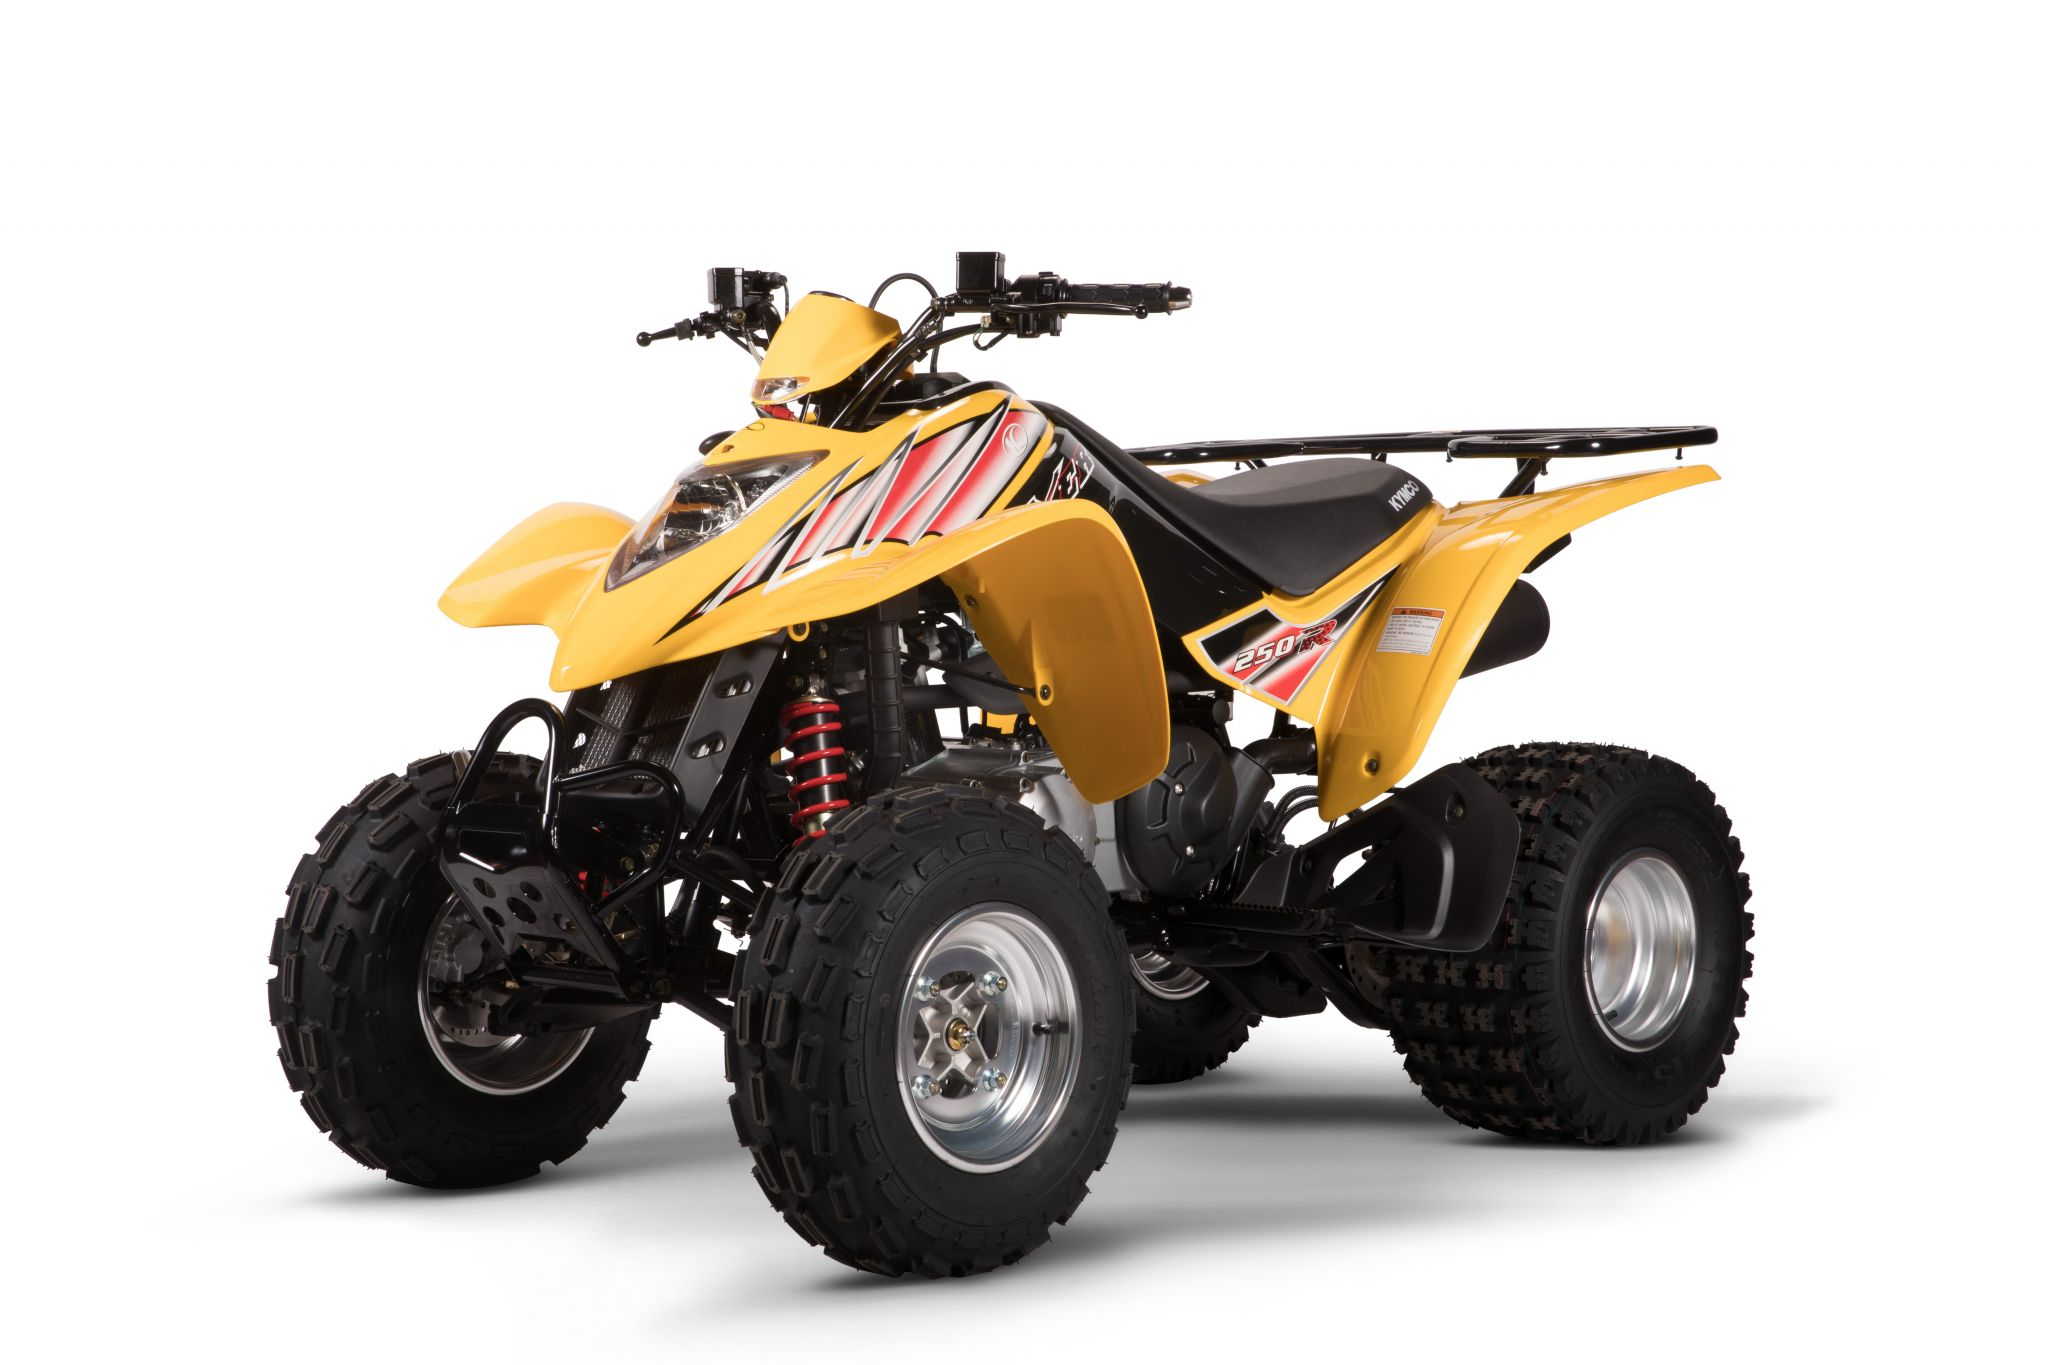 MAXXER 250 צהוב